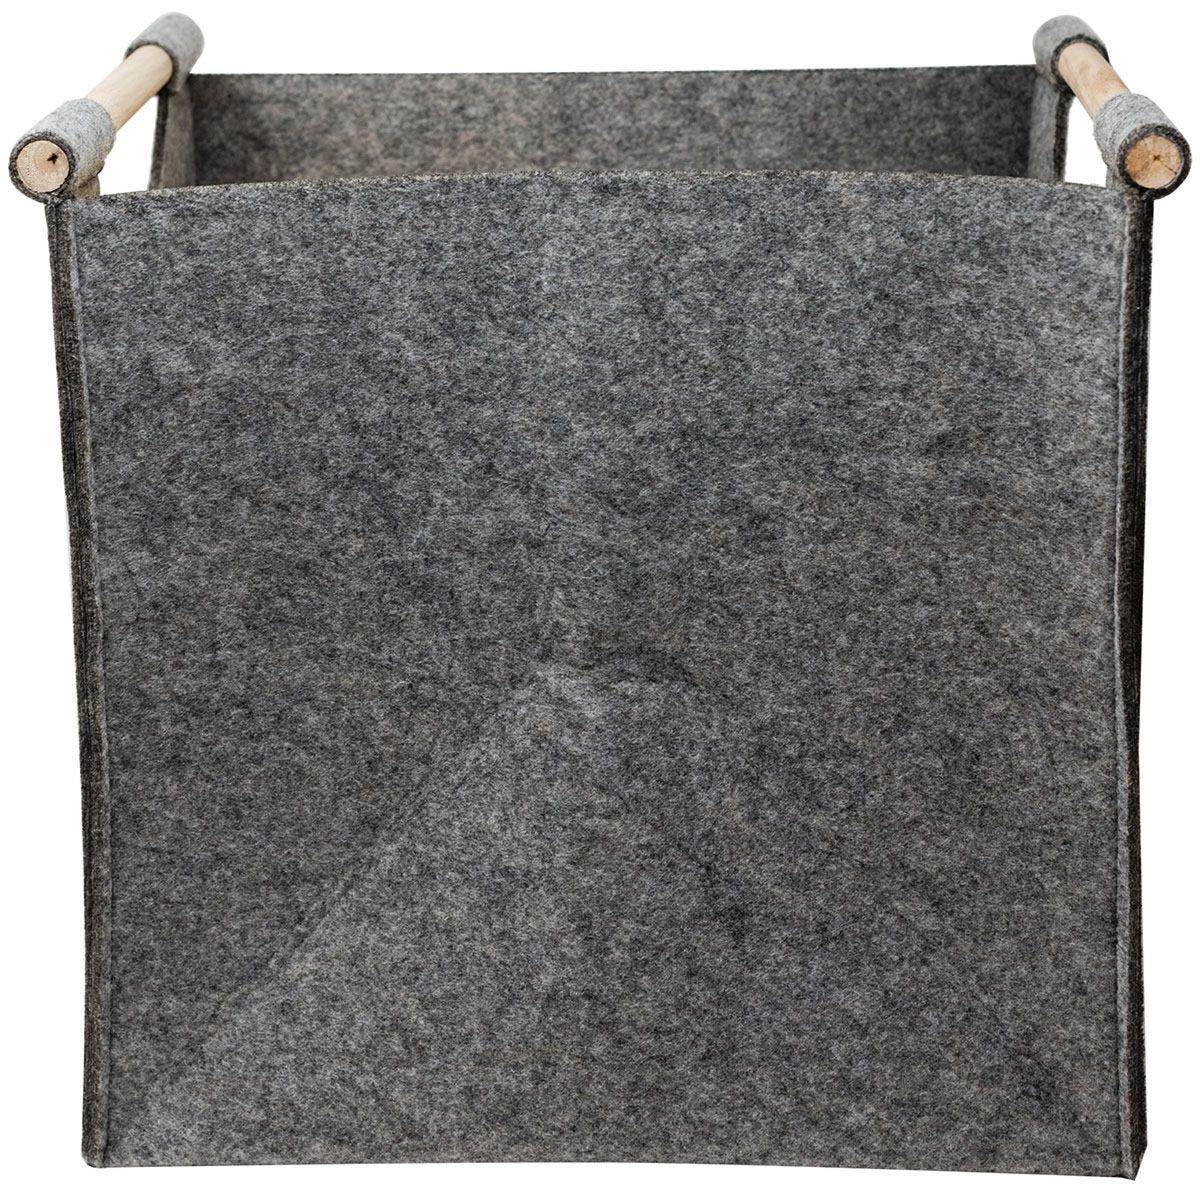 Korbond Deluxe Knitters Yarn Tote Bag